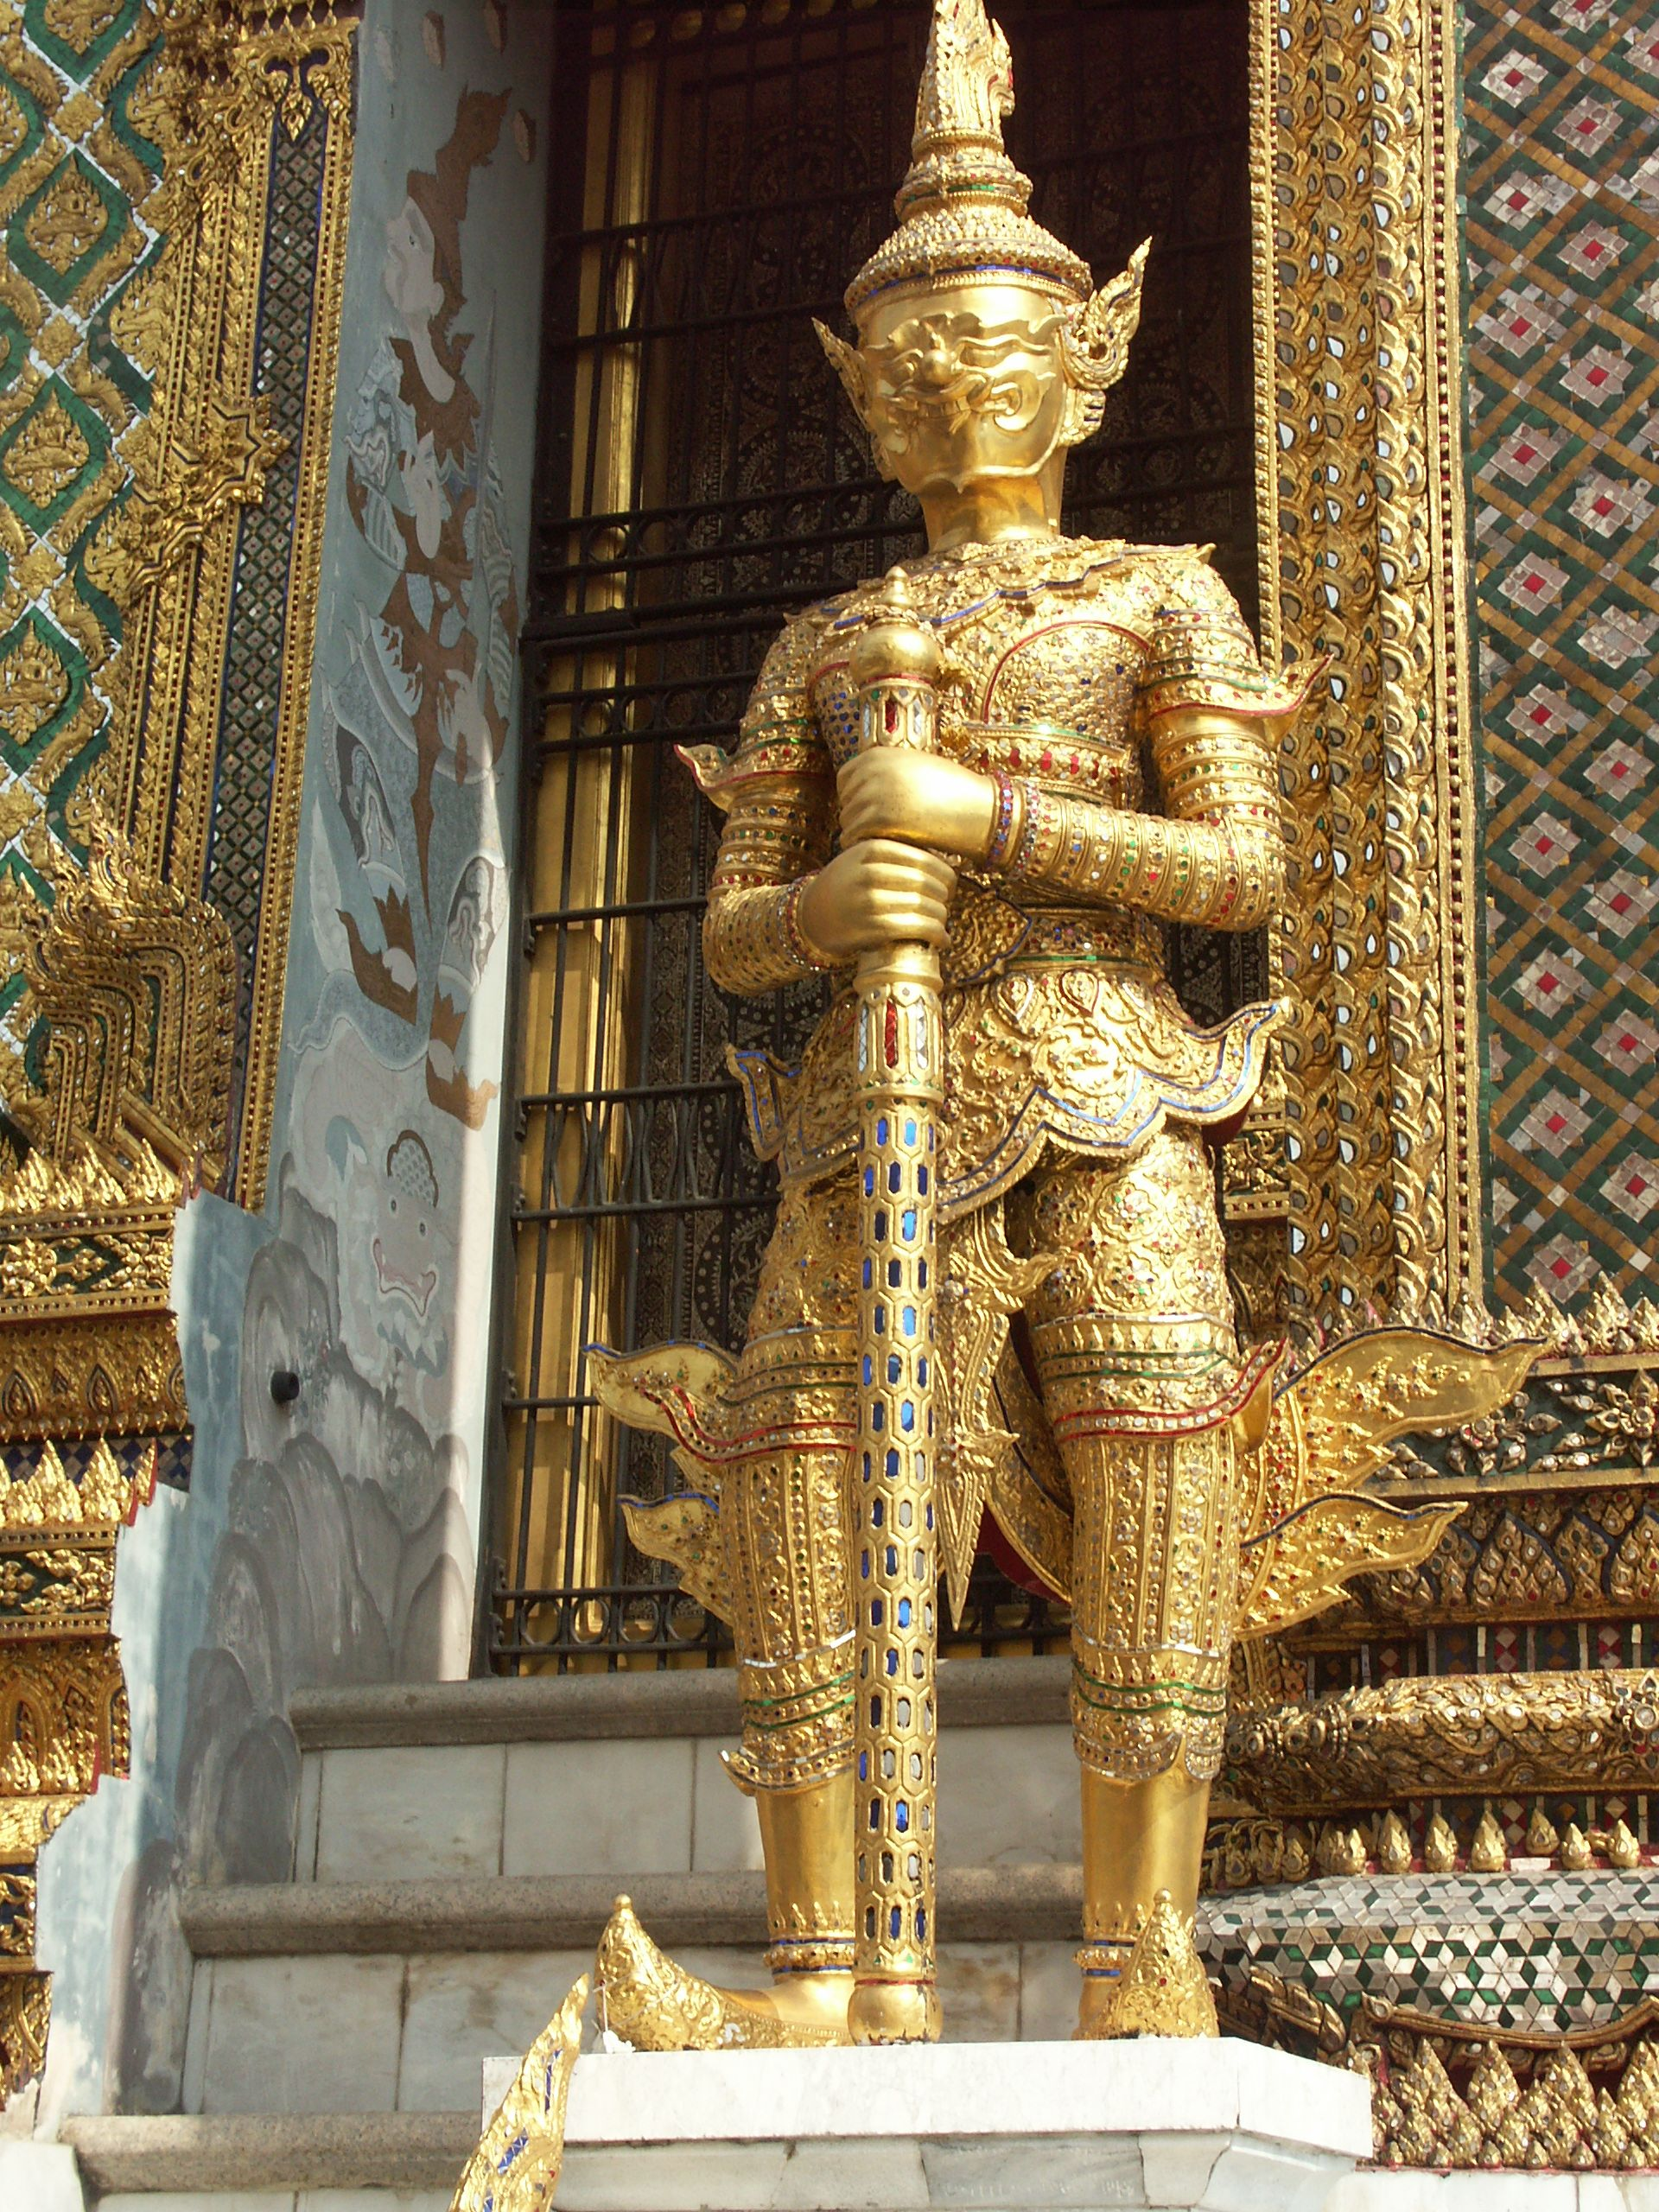 Bangkok Grand Pallace Thailland  photo by me